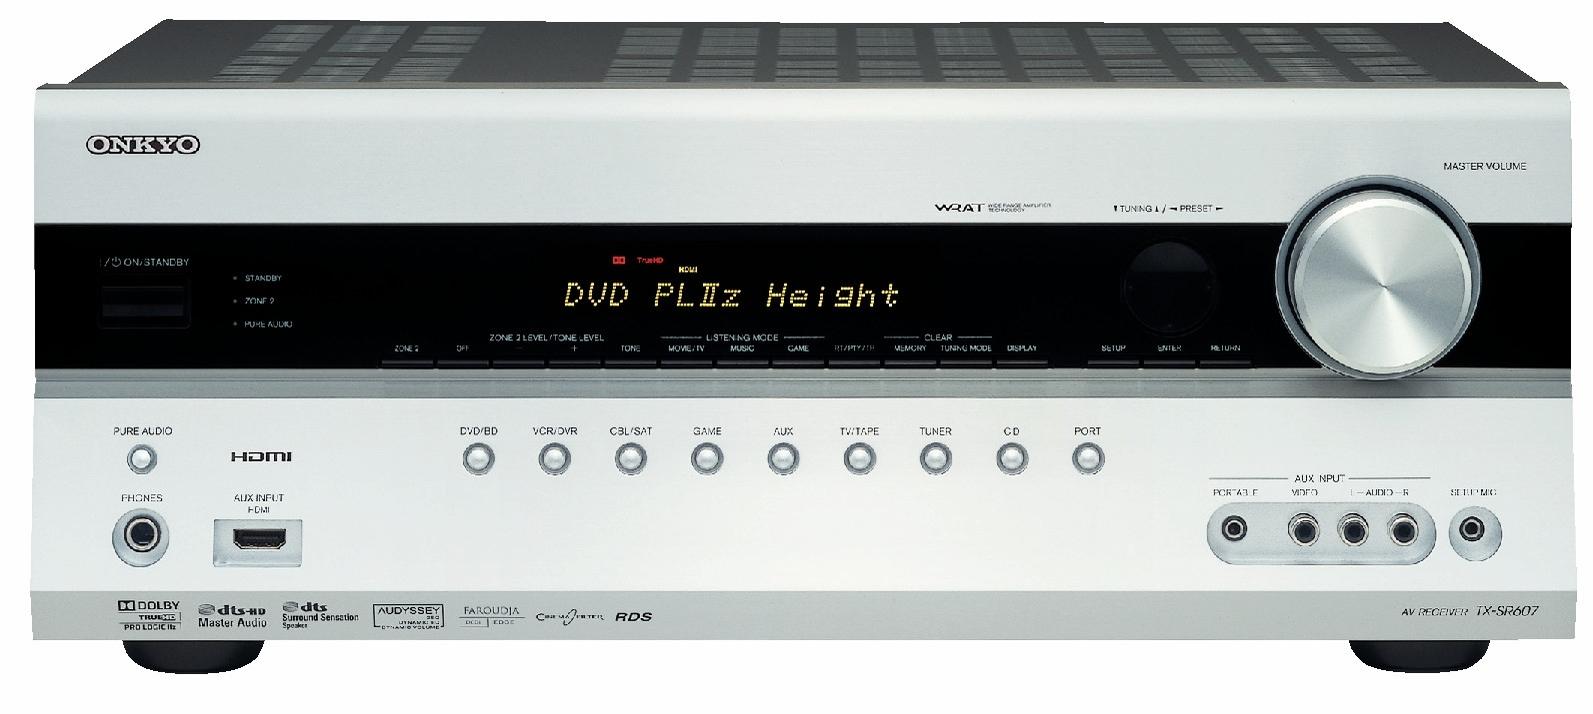 Onkyo TX-SR607 skal være verdens første hjemmekinoreceiver med Dolby Pro Logic IIz.